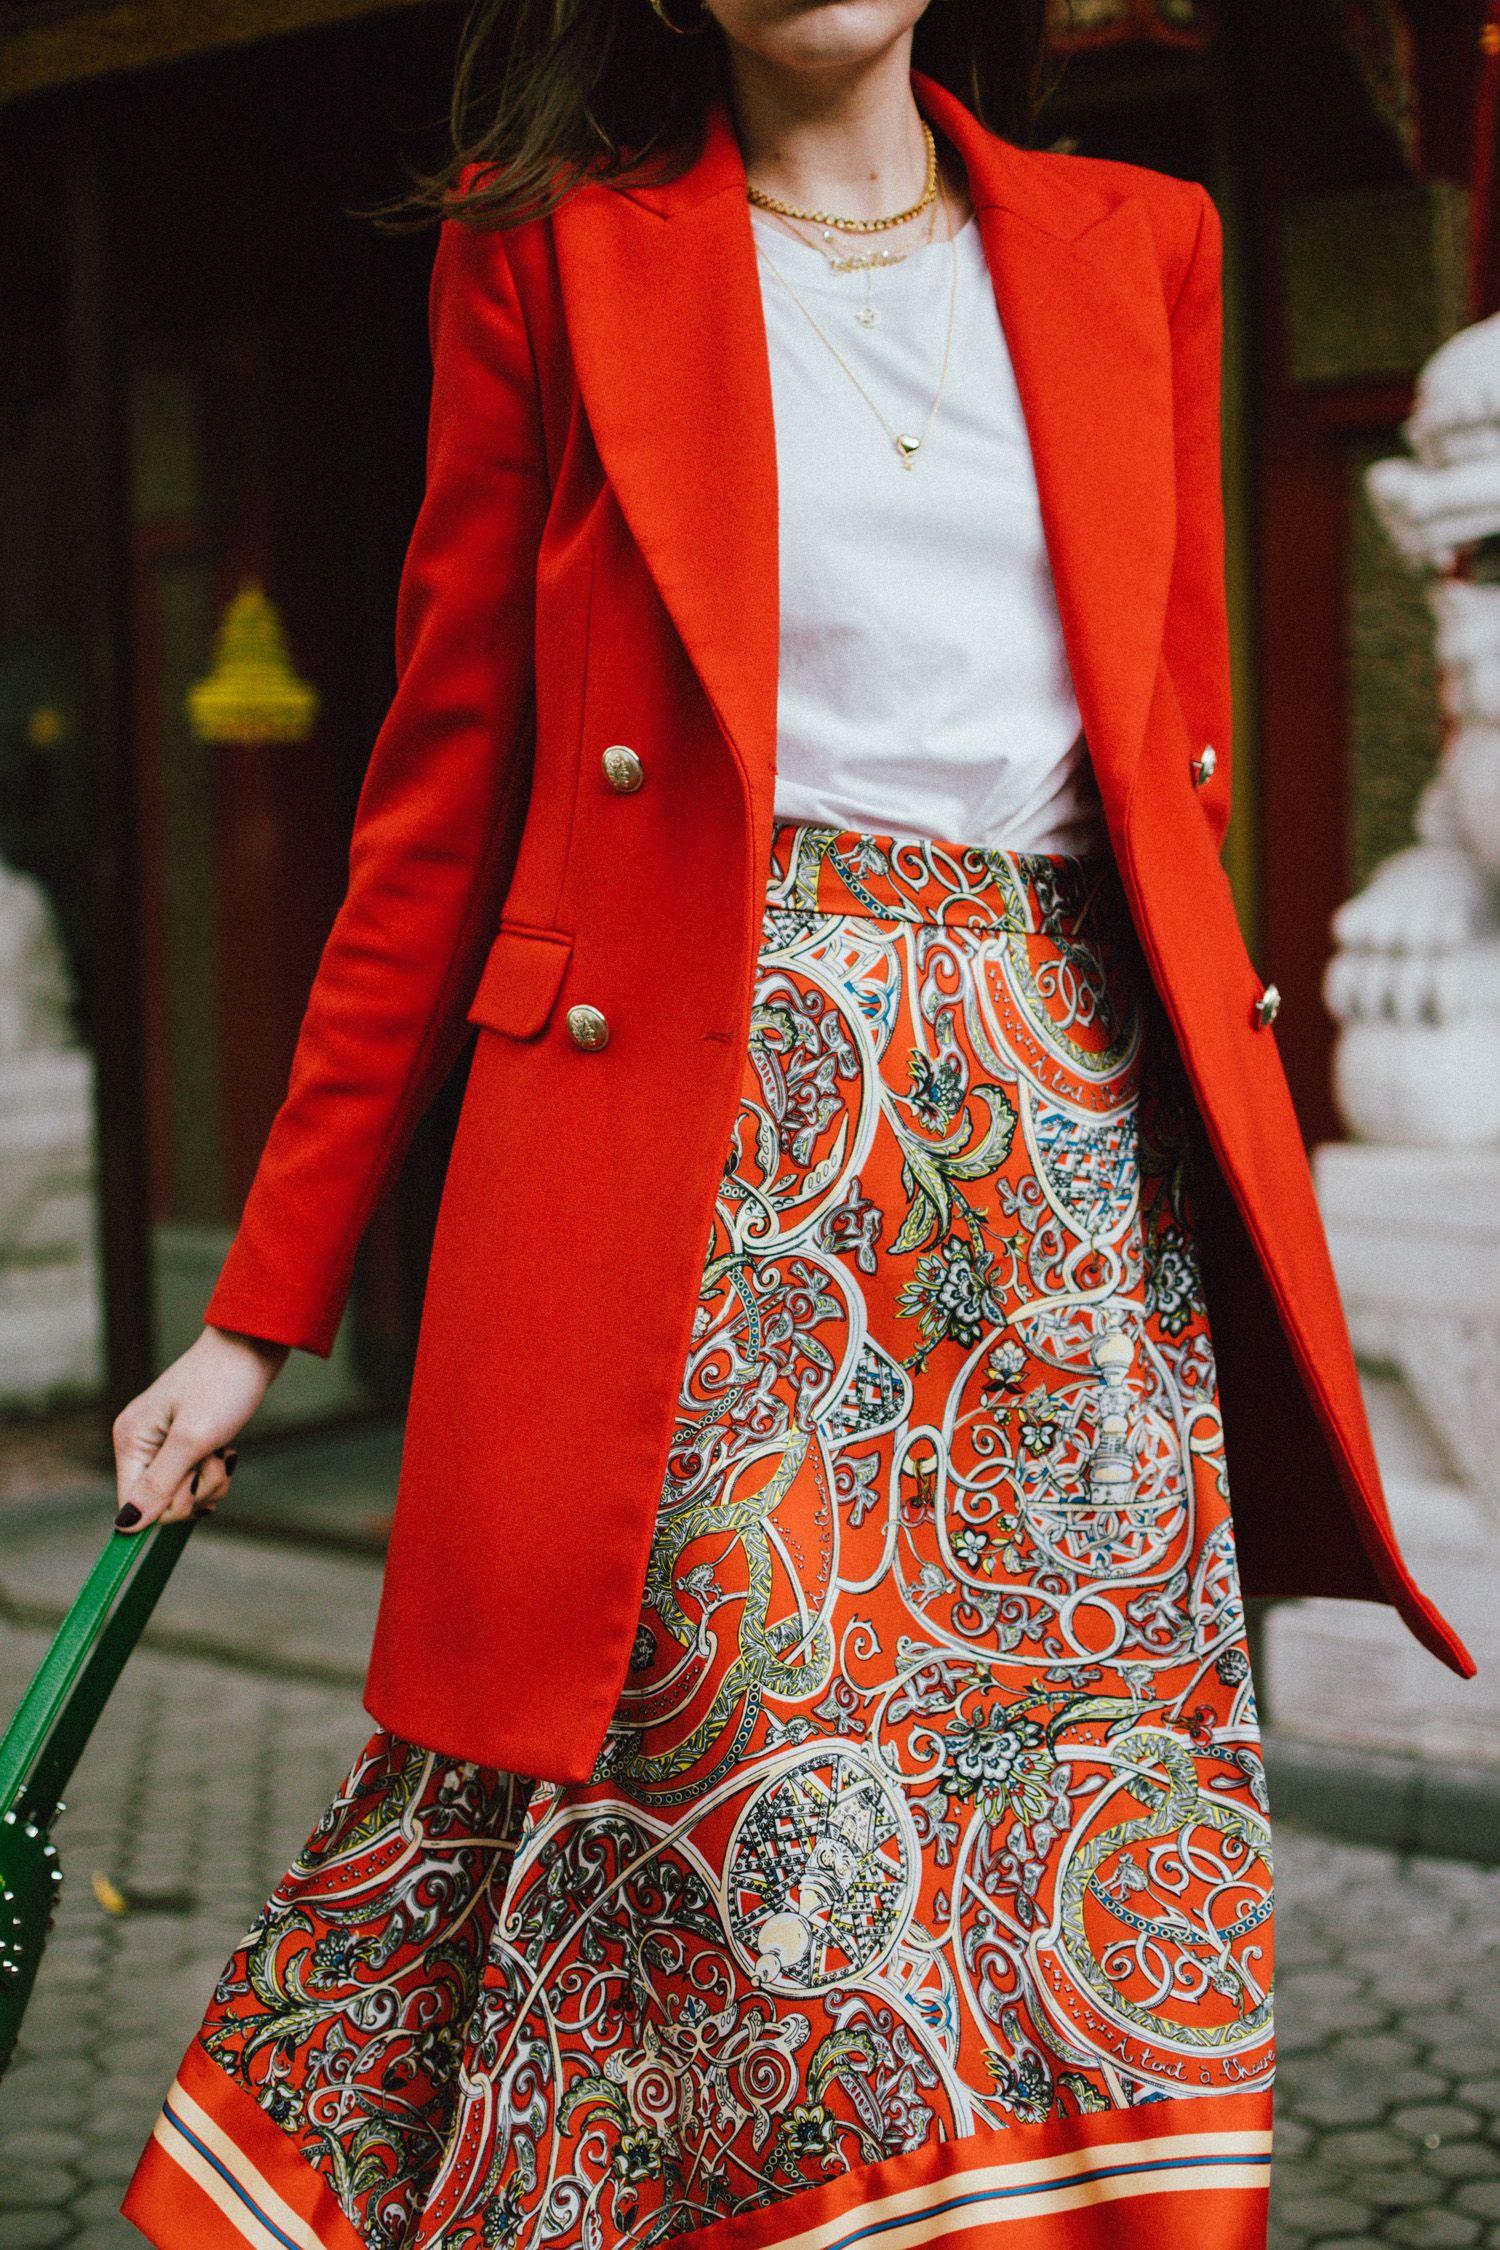 38ea5c0107da Zara double breasted long orange blazer, h&m patterned orange asymmetric midi  skirt, gucci white and red leather sneakers, prada green saffiano leather  ...